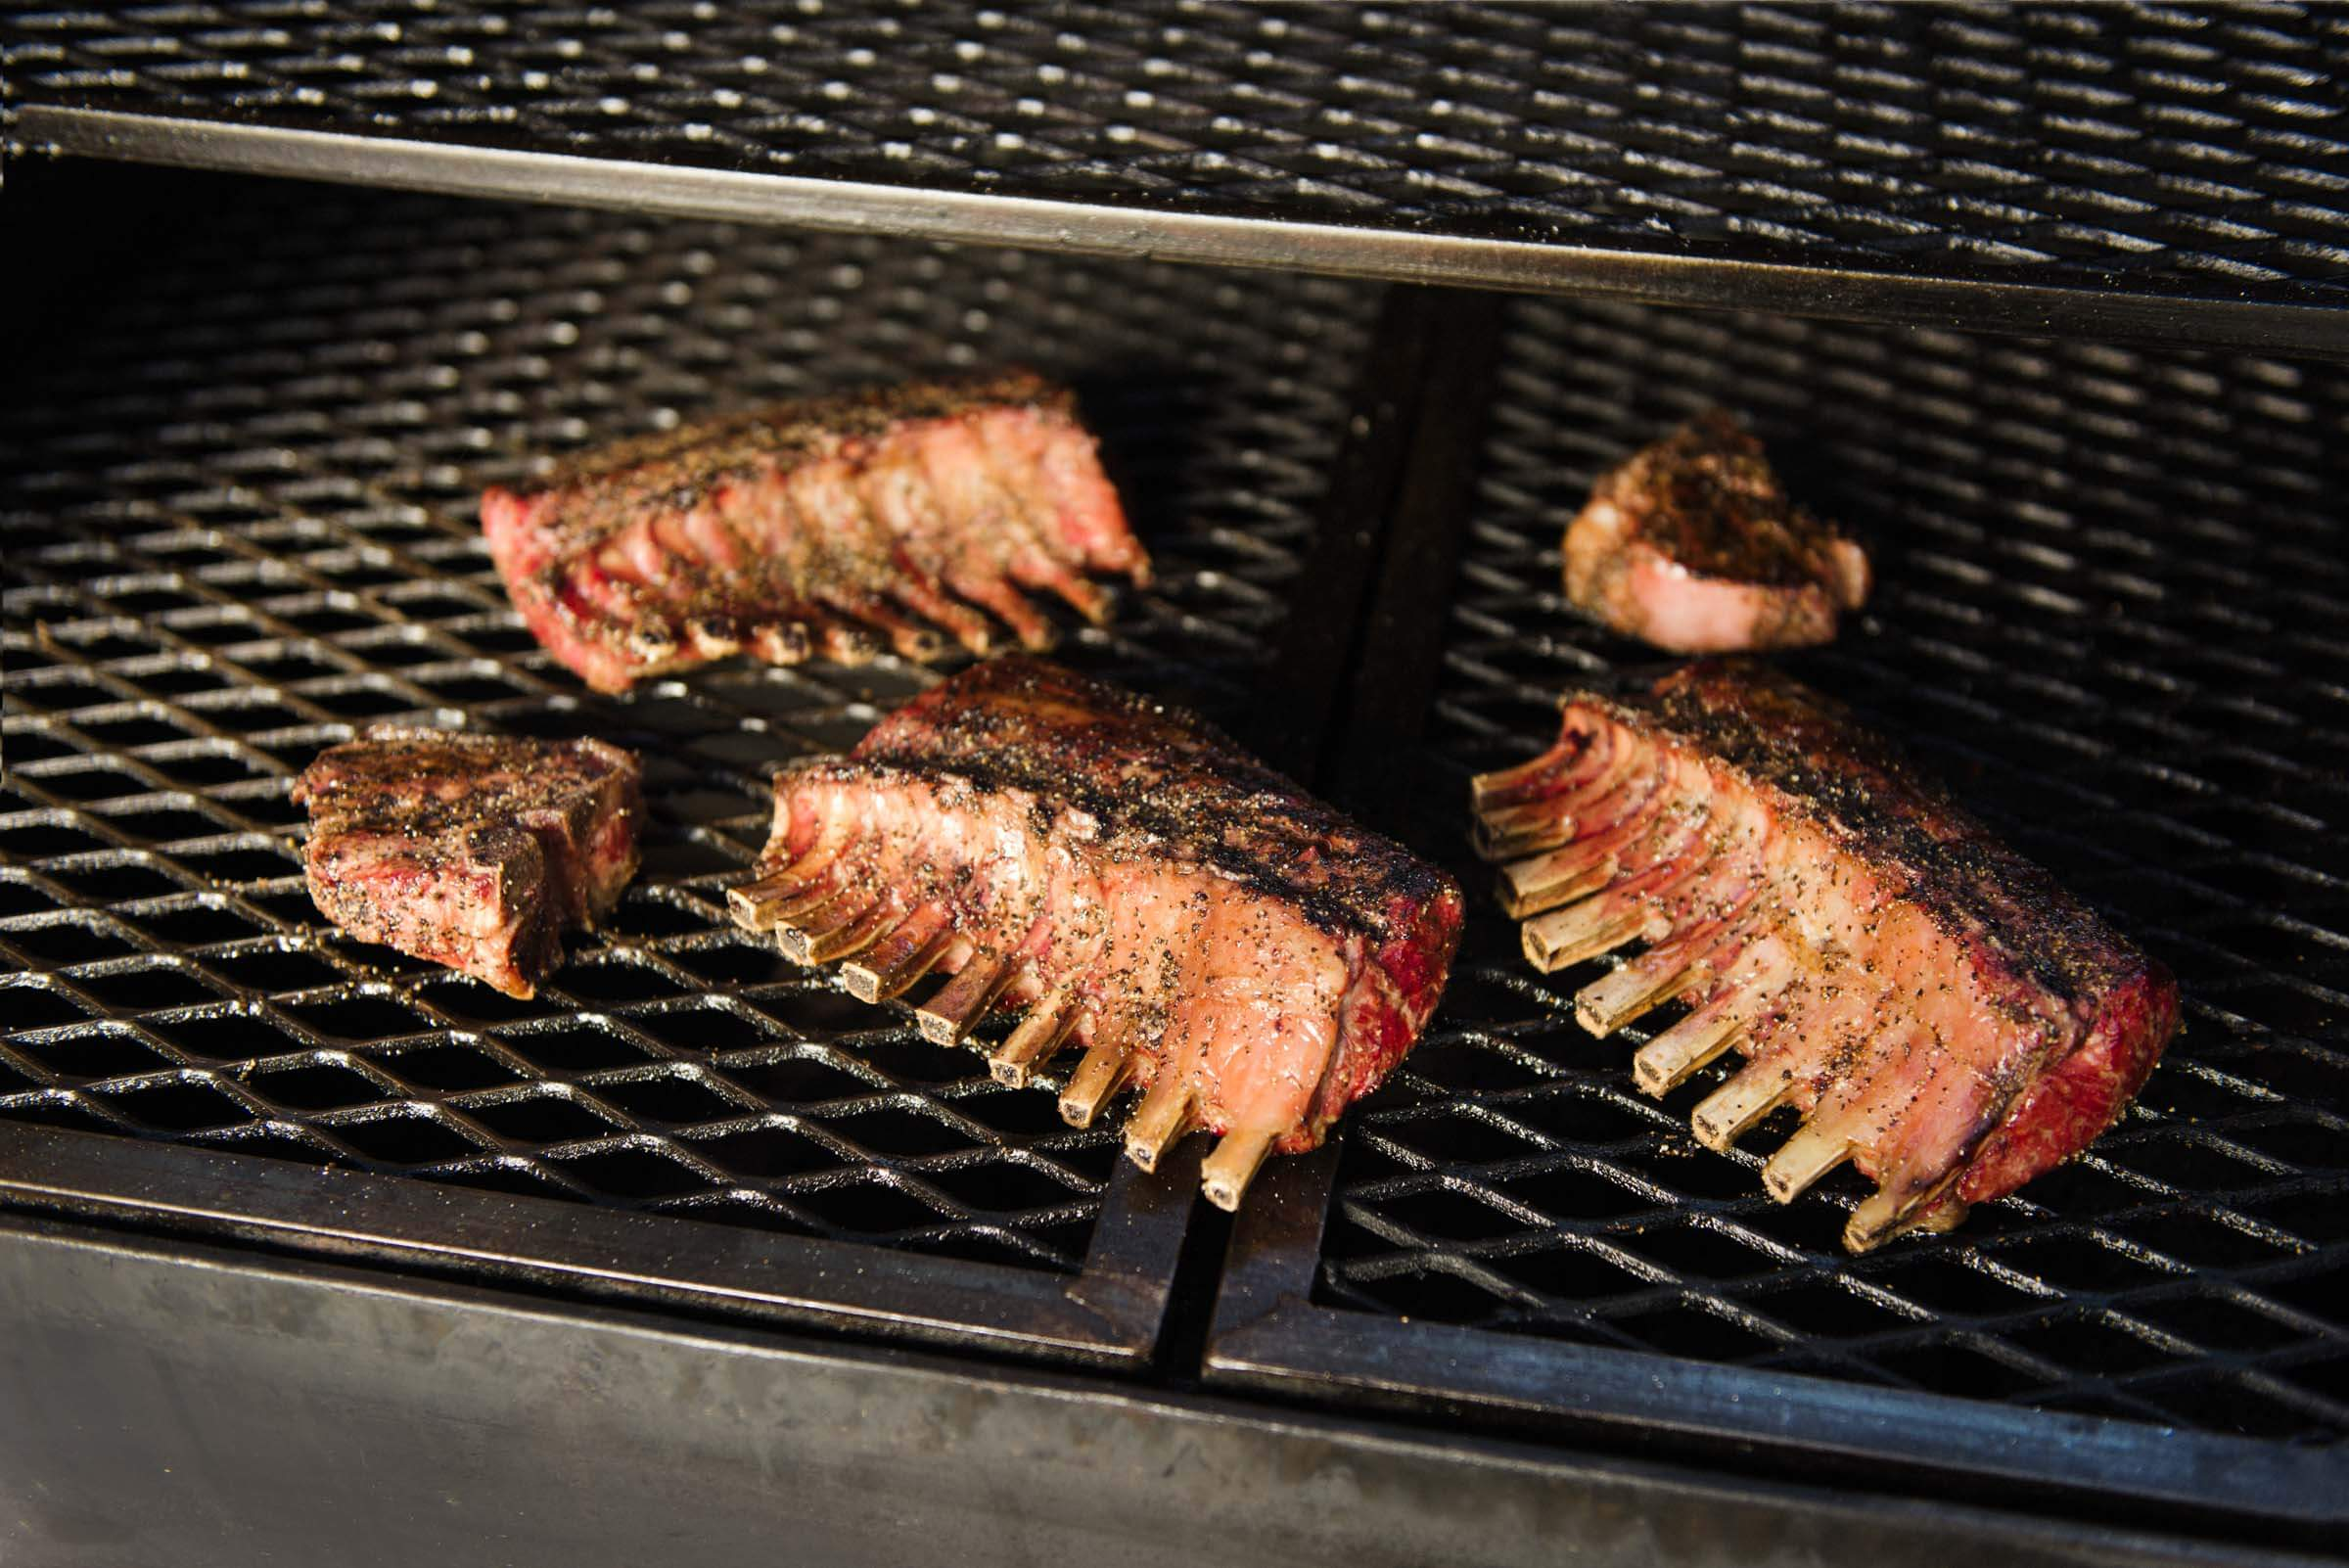 racks of lamb on the bbq grill